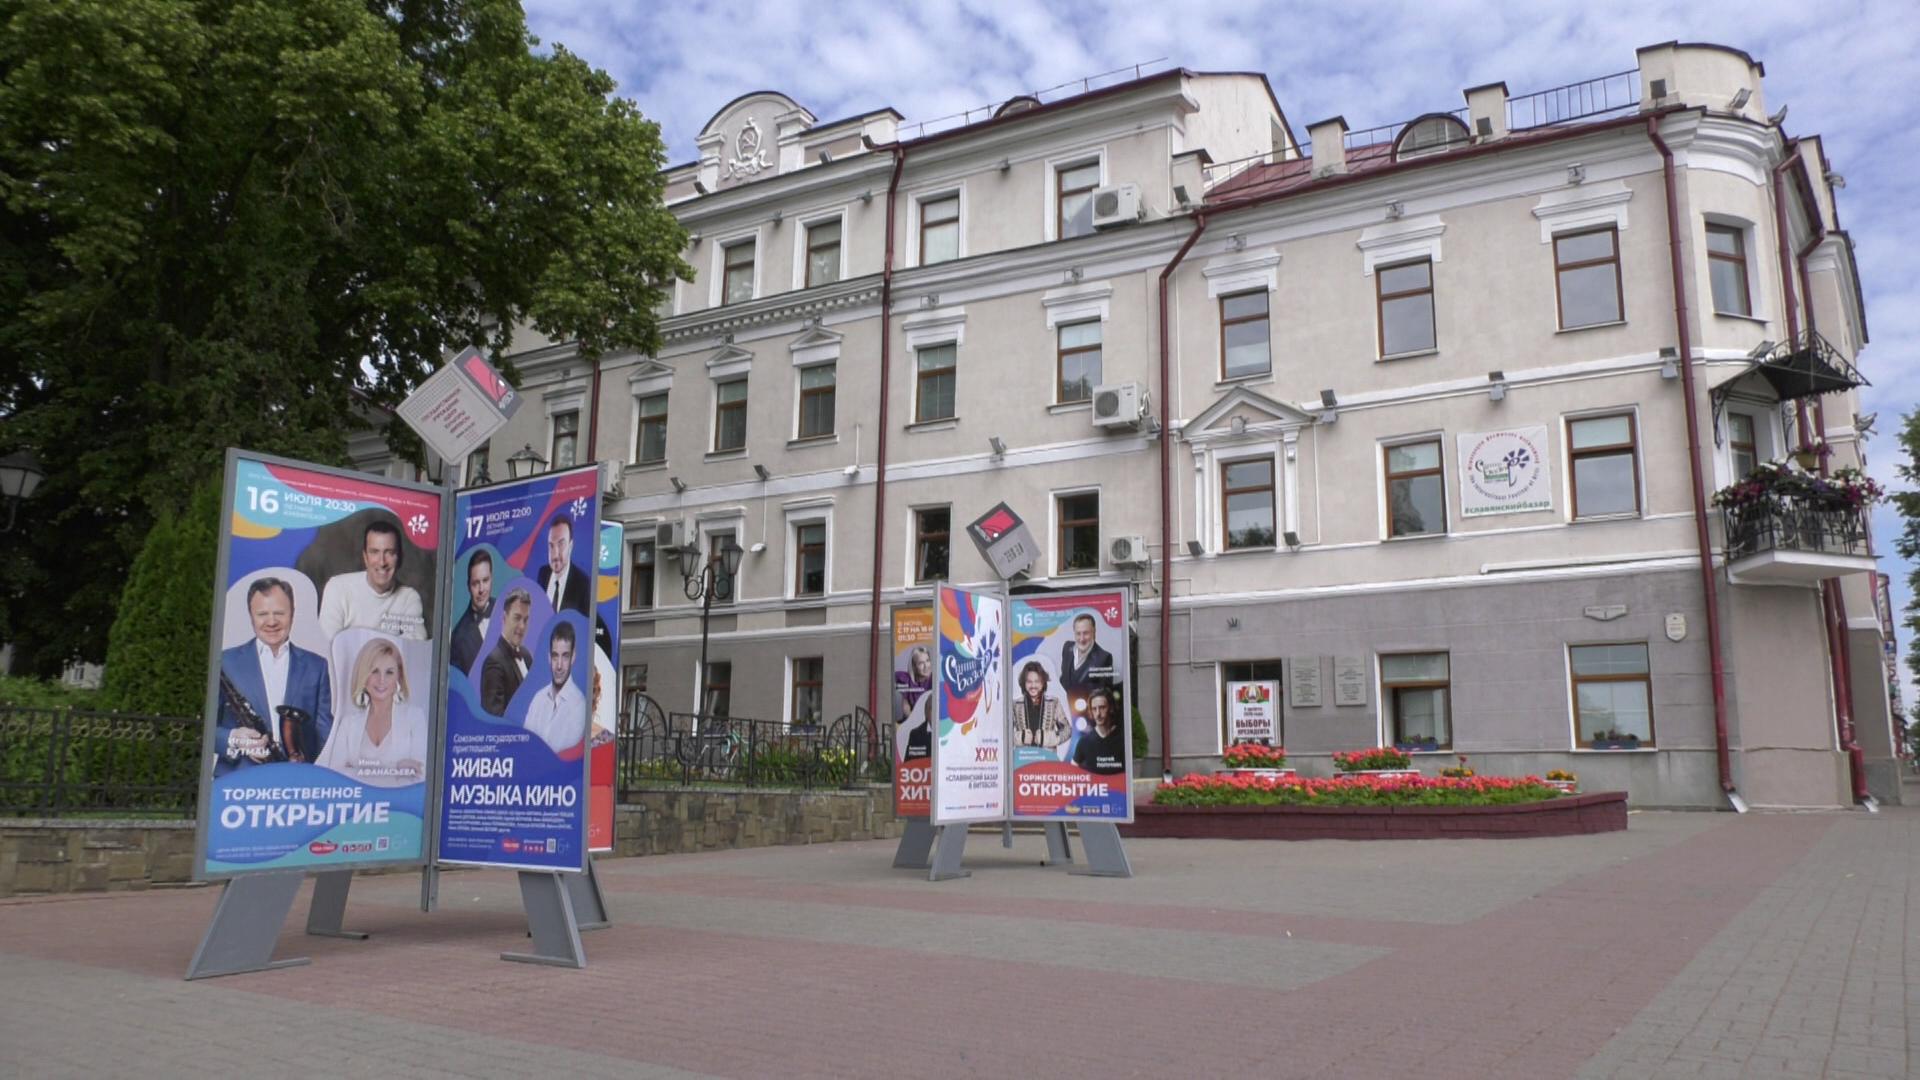 slavjanskij bazar - Витебск готовится принять 29-ый «Славянский базар» (видео)